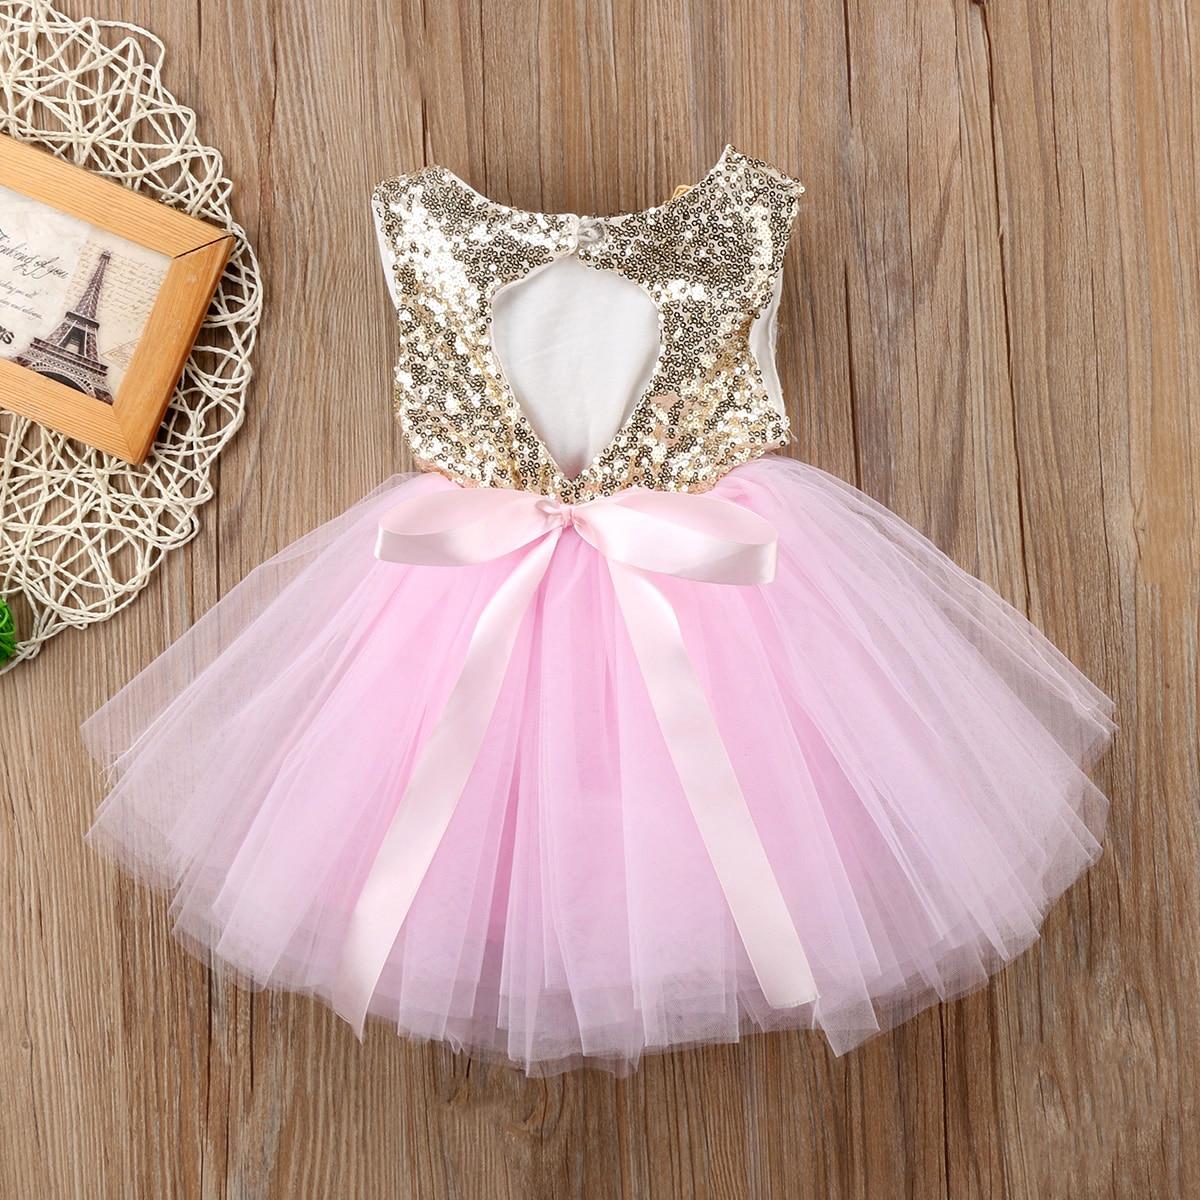 Princess Kids Baby Dress For Girls Fancy Wedding Dress Sleeveless Sequins Party Birthday Baptism Dress For Girl Summer Dresses